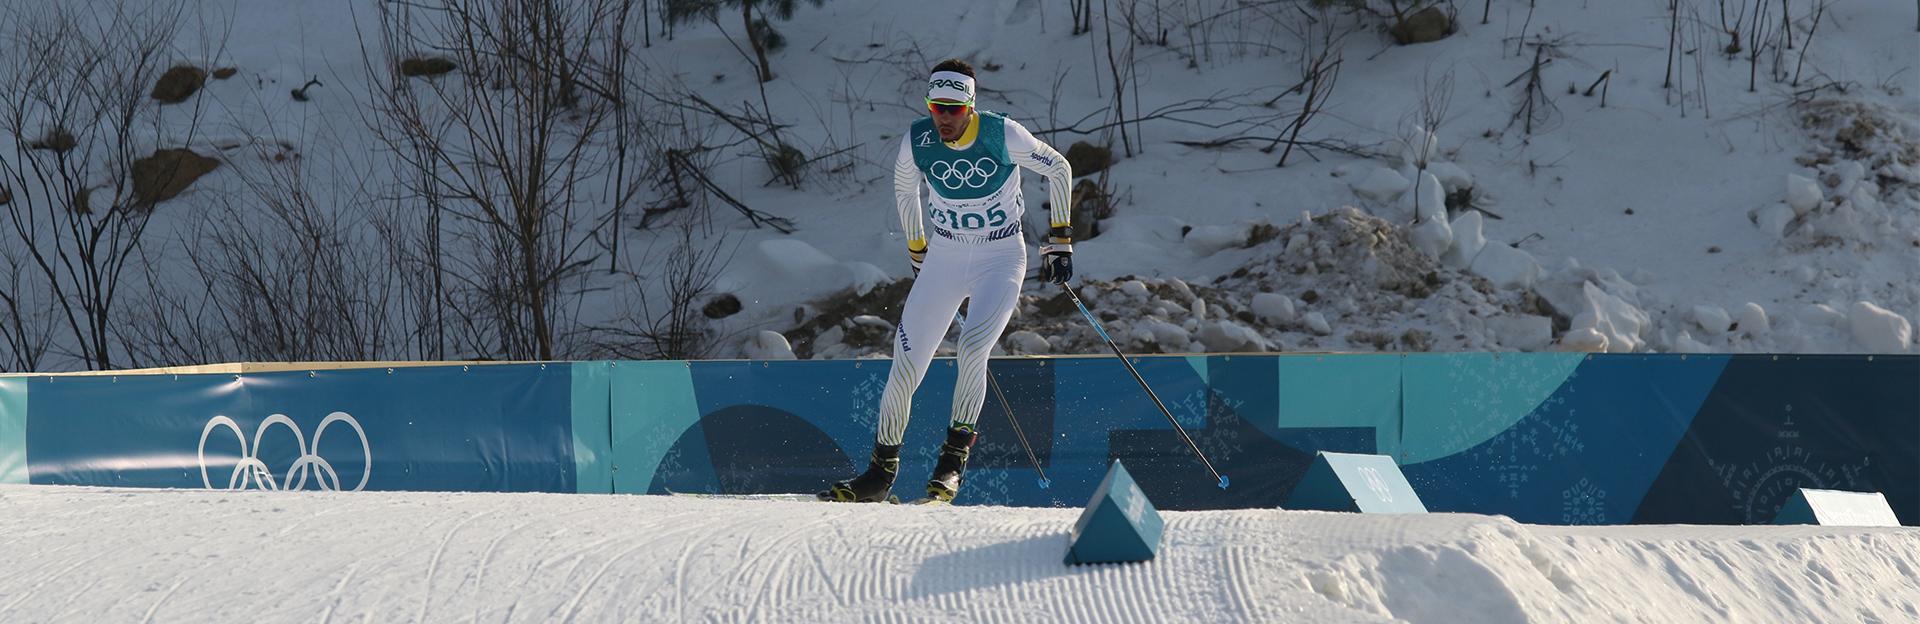 victor santos faz estreia olímpica